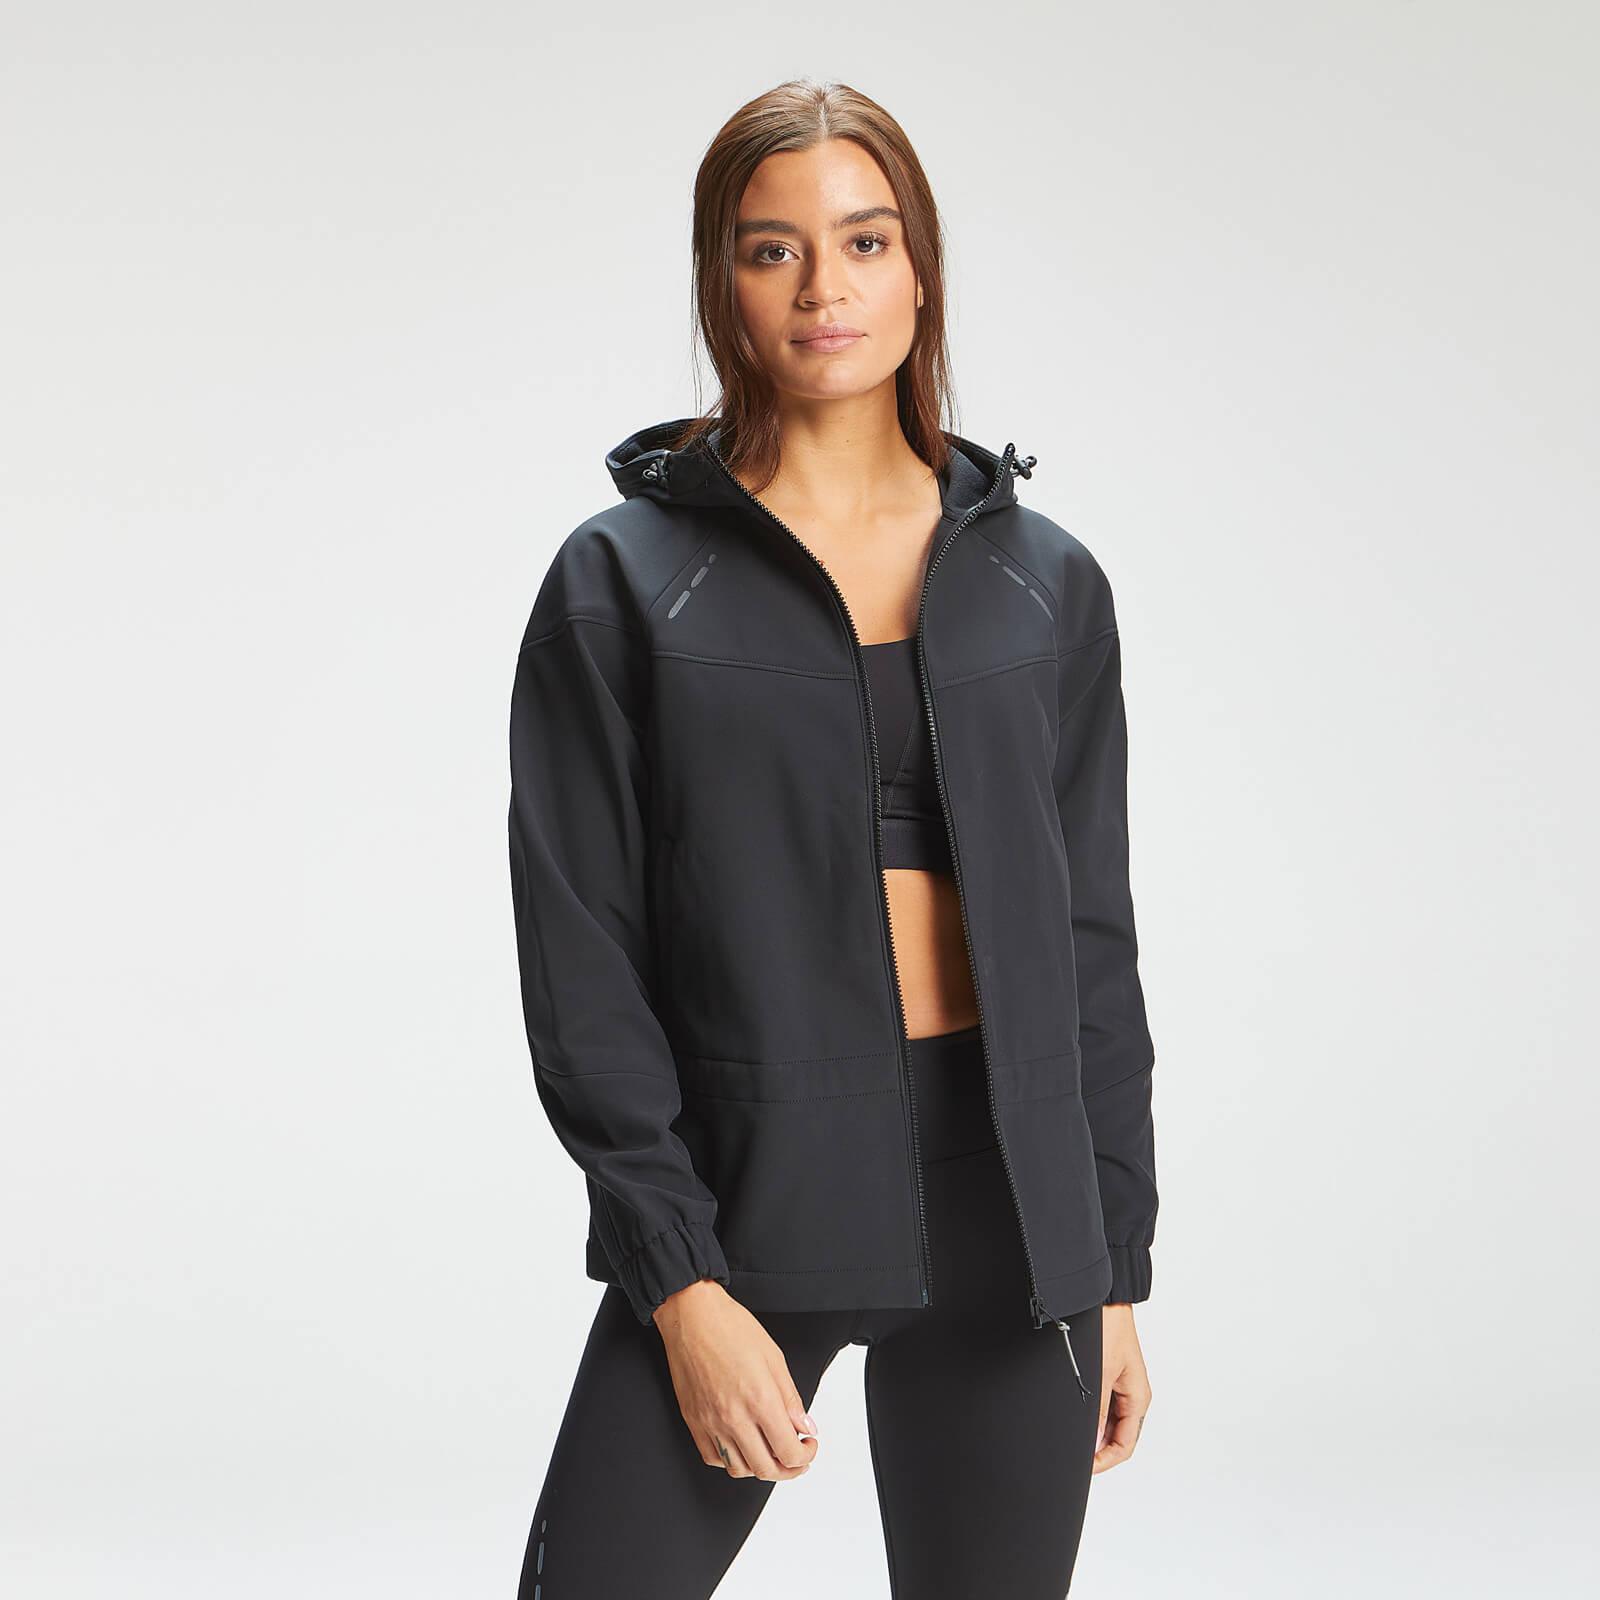 Купить MP Women's Power Ultra Soft Shell Jacket - Black - XXS, Myprotein International